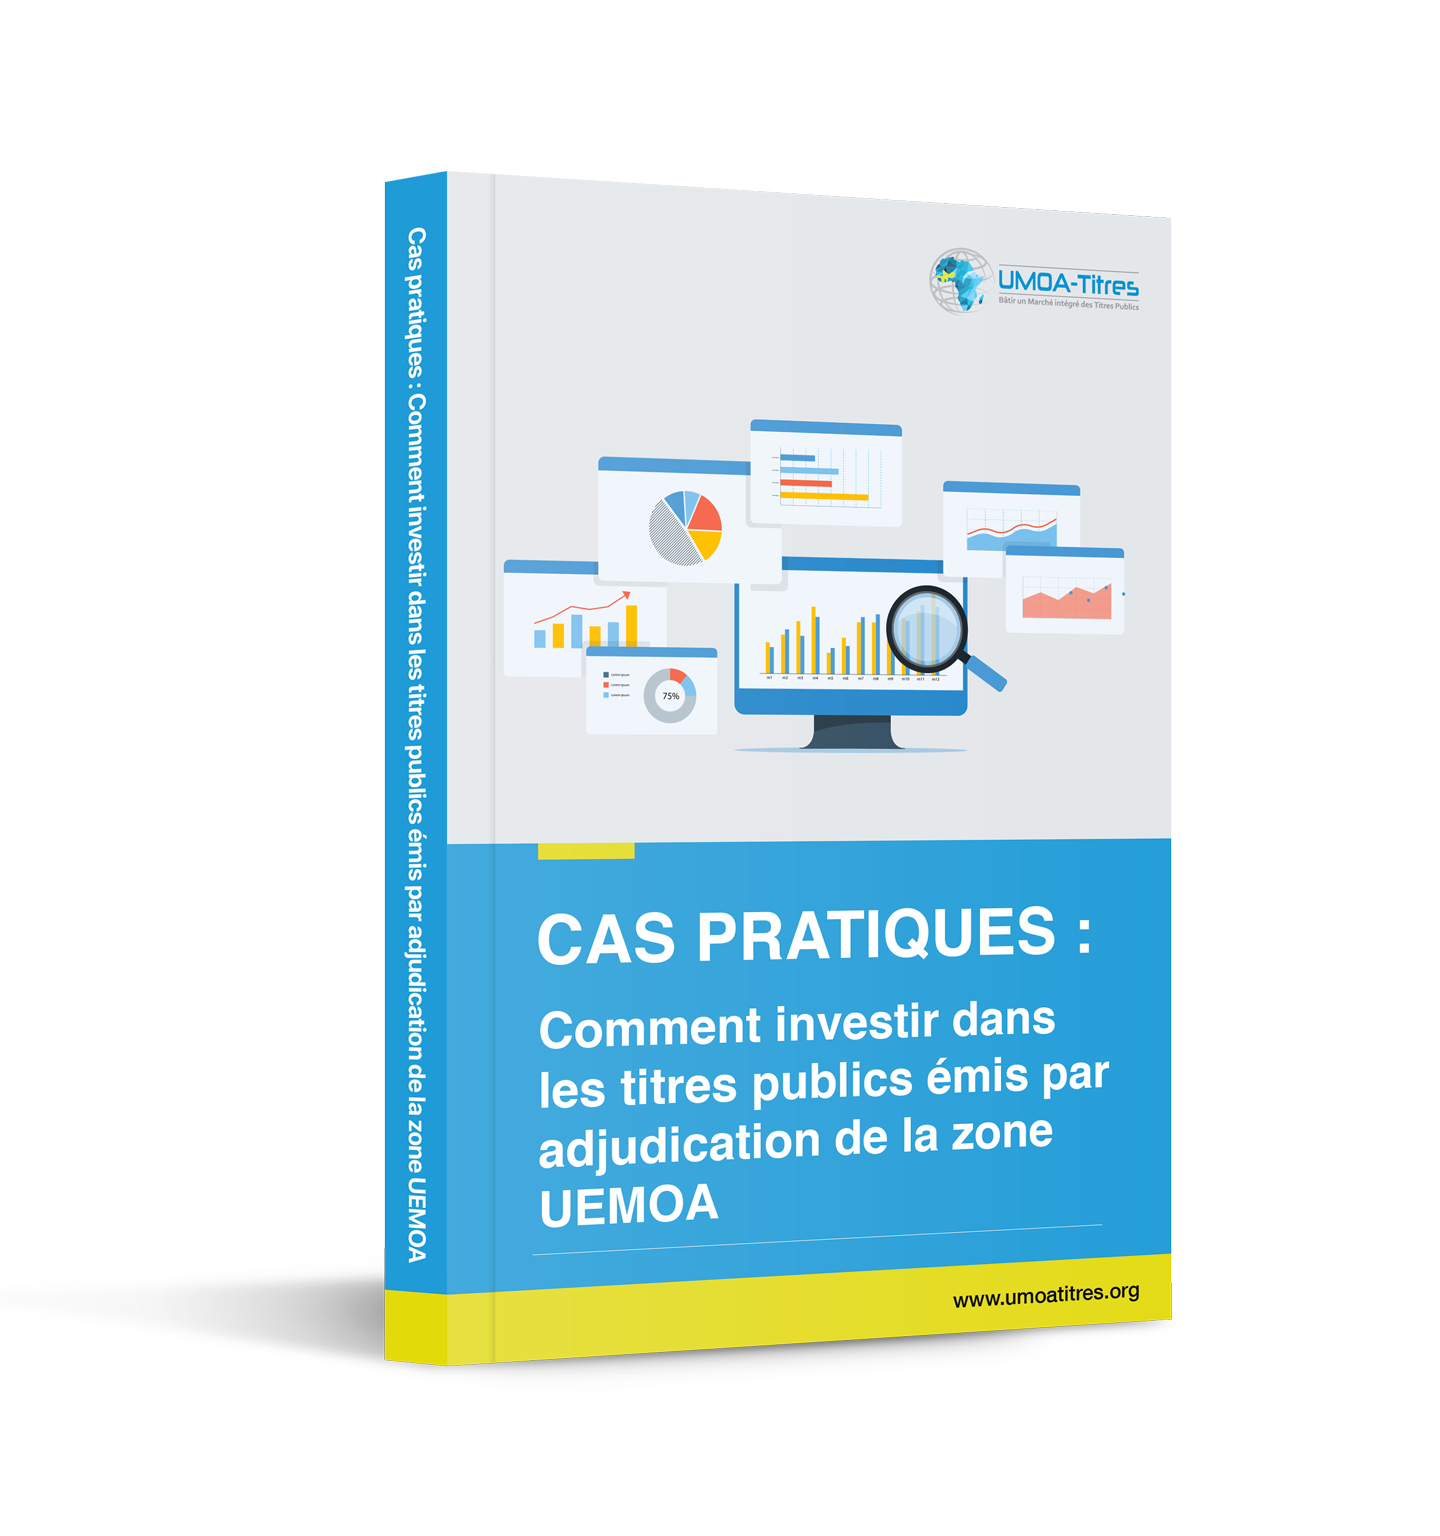 CasPratique_mockup_3 (1) (2)